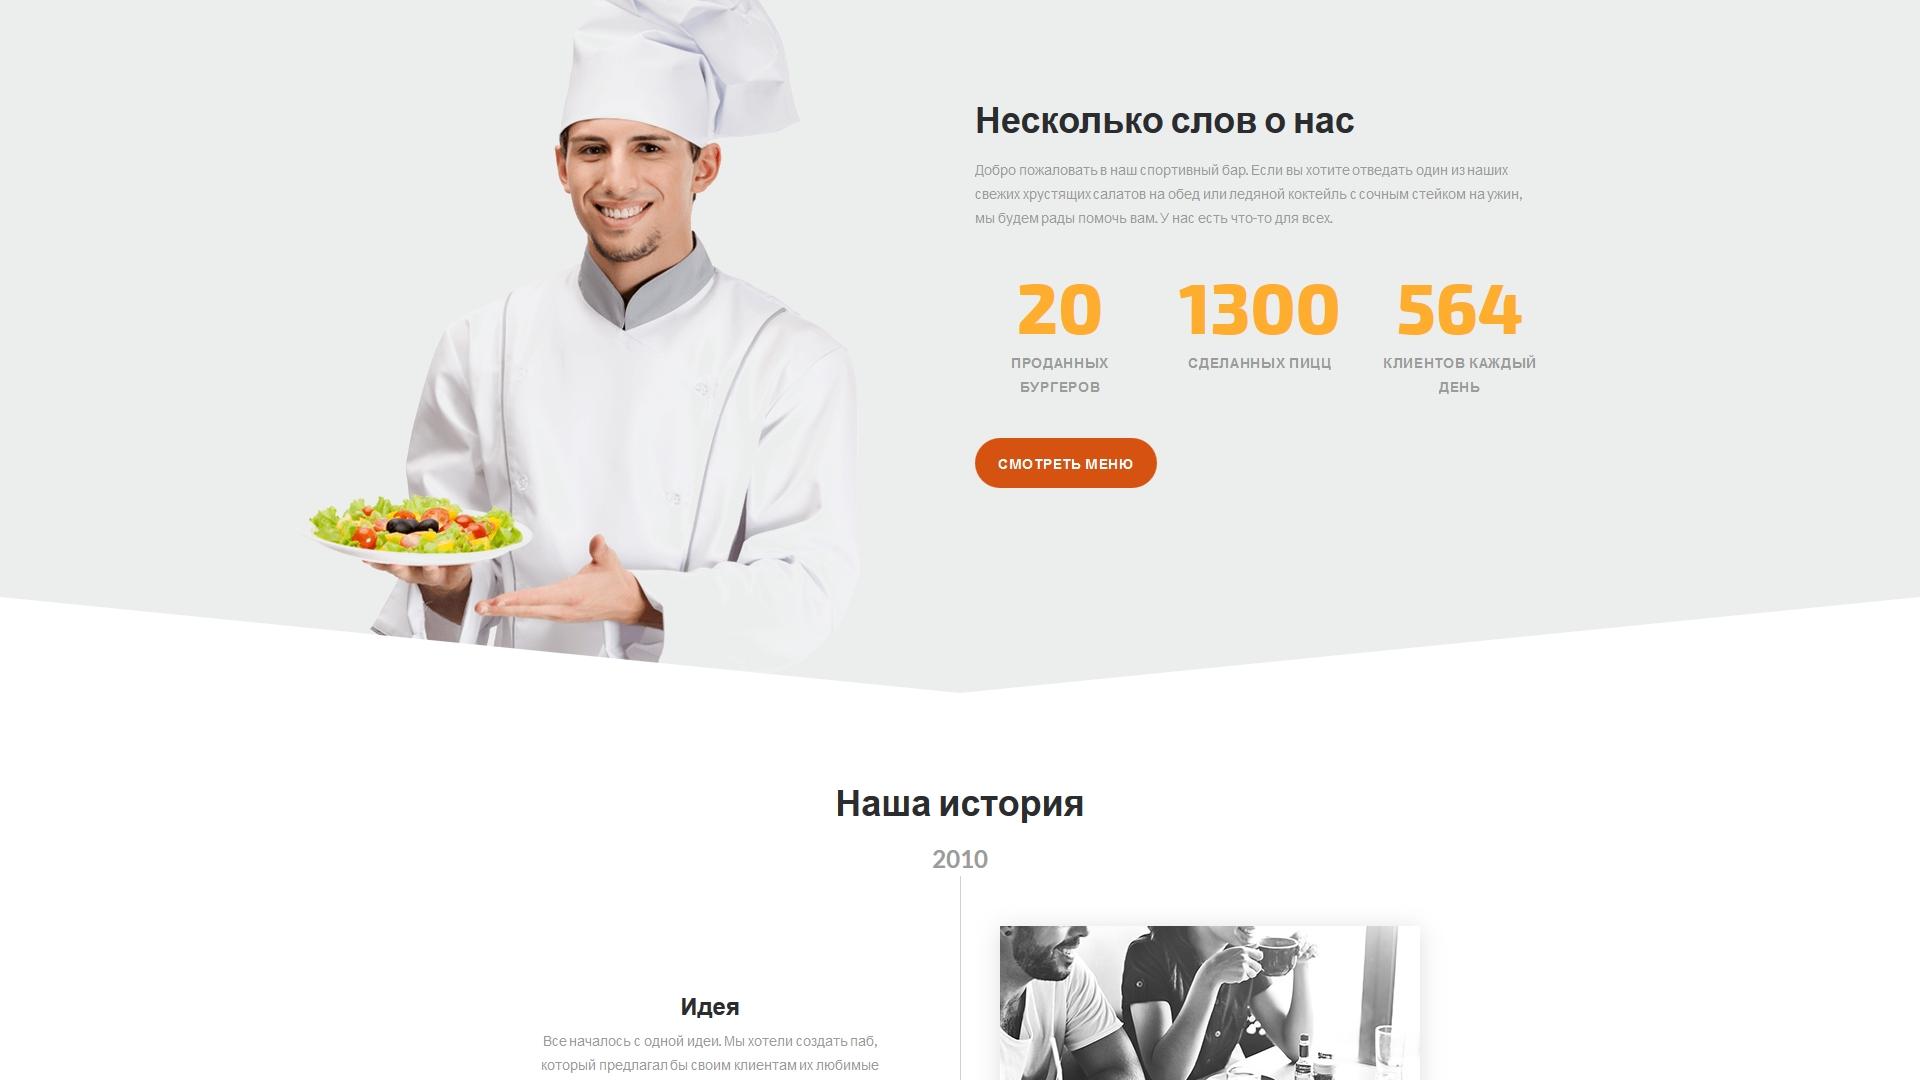 https://s3u.tmimgcdn.com/1519369-1553003087160_Image-03.jpg